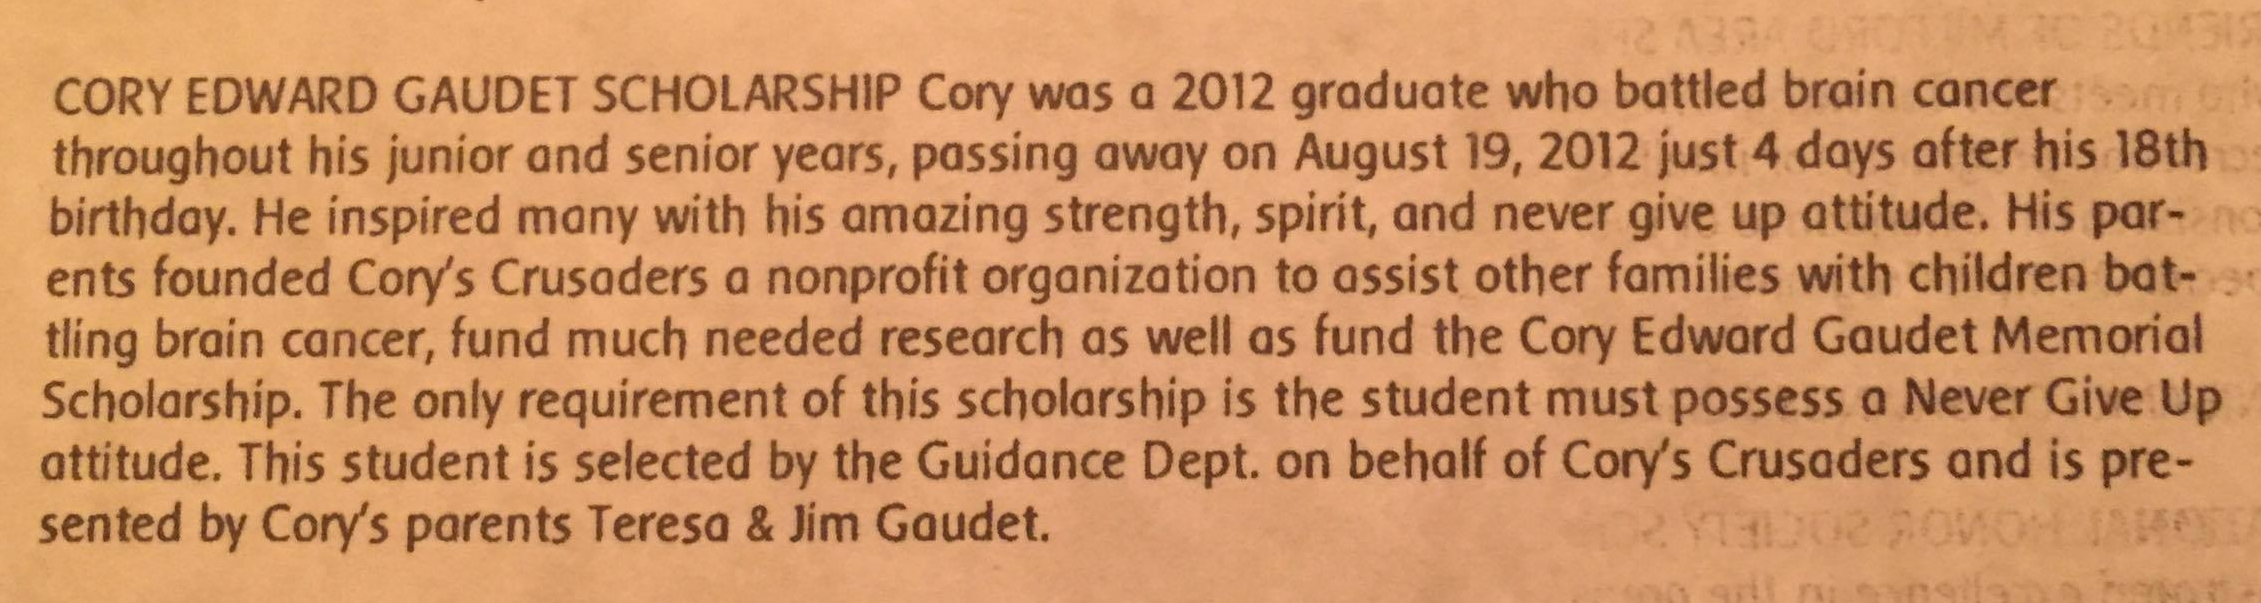 Cory Edward Gaudet Memorial Scholarship.jpg